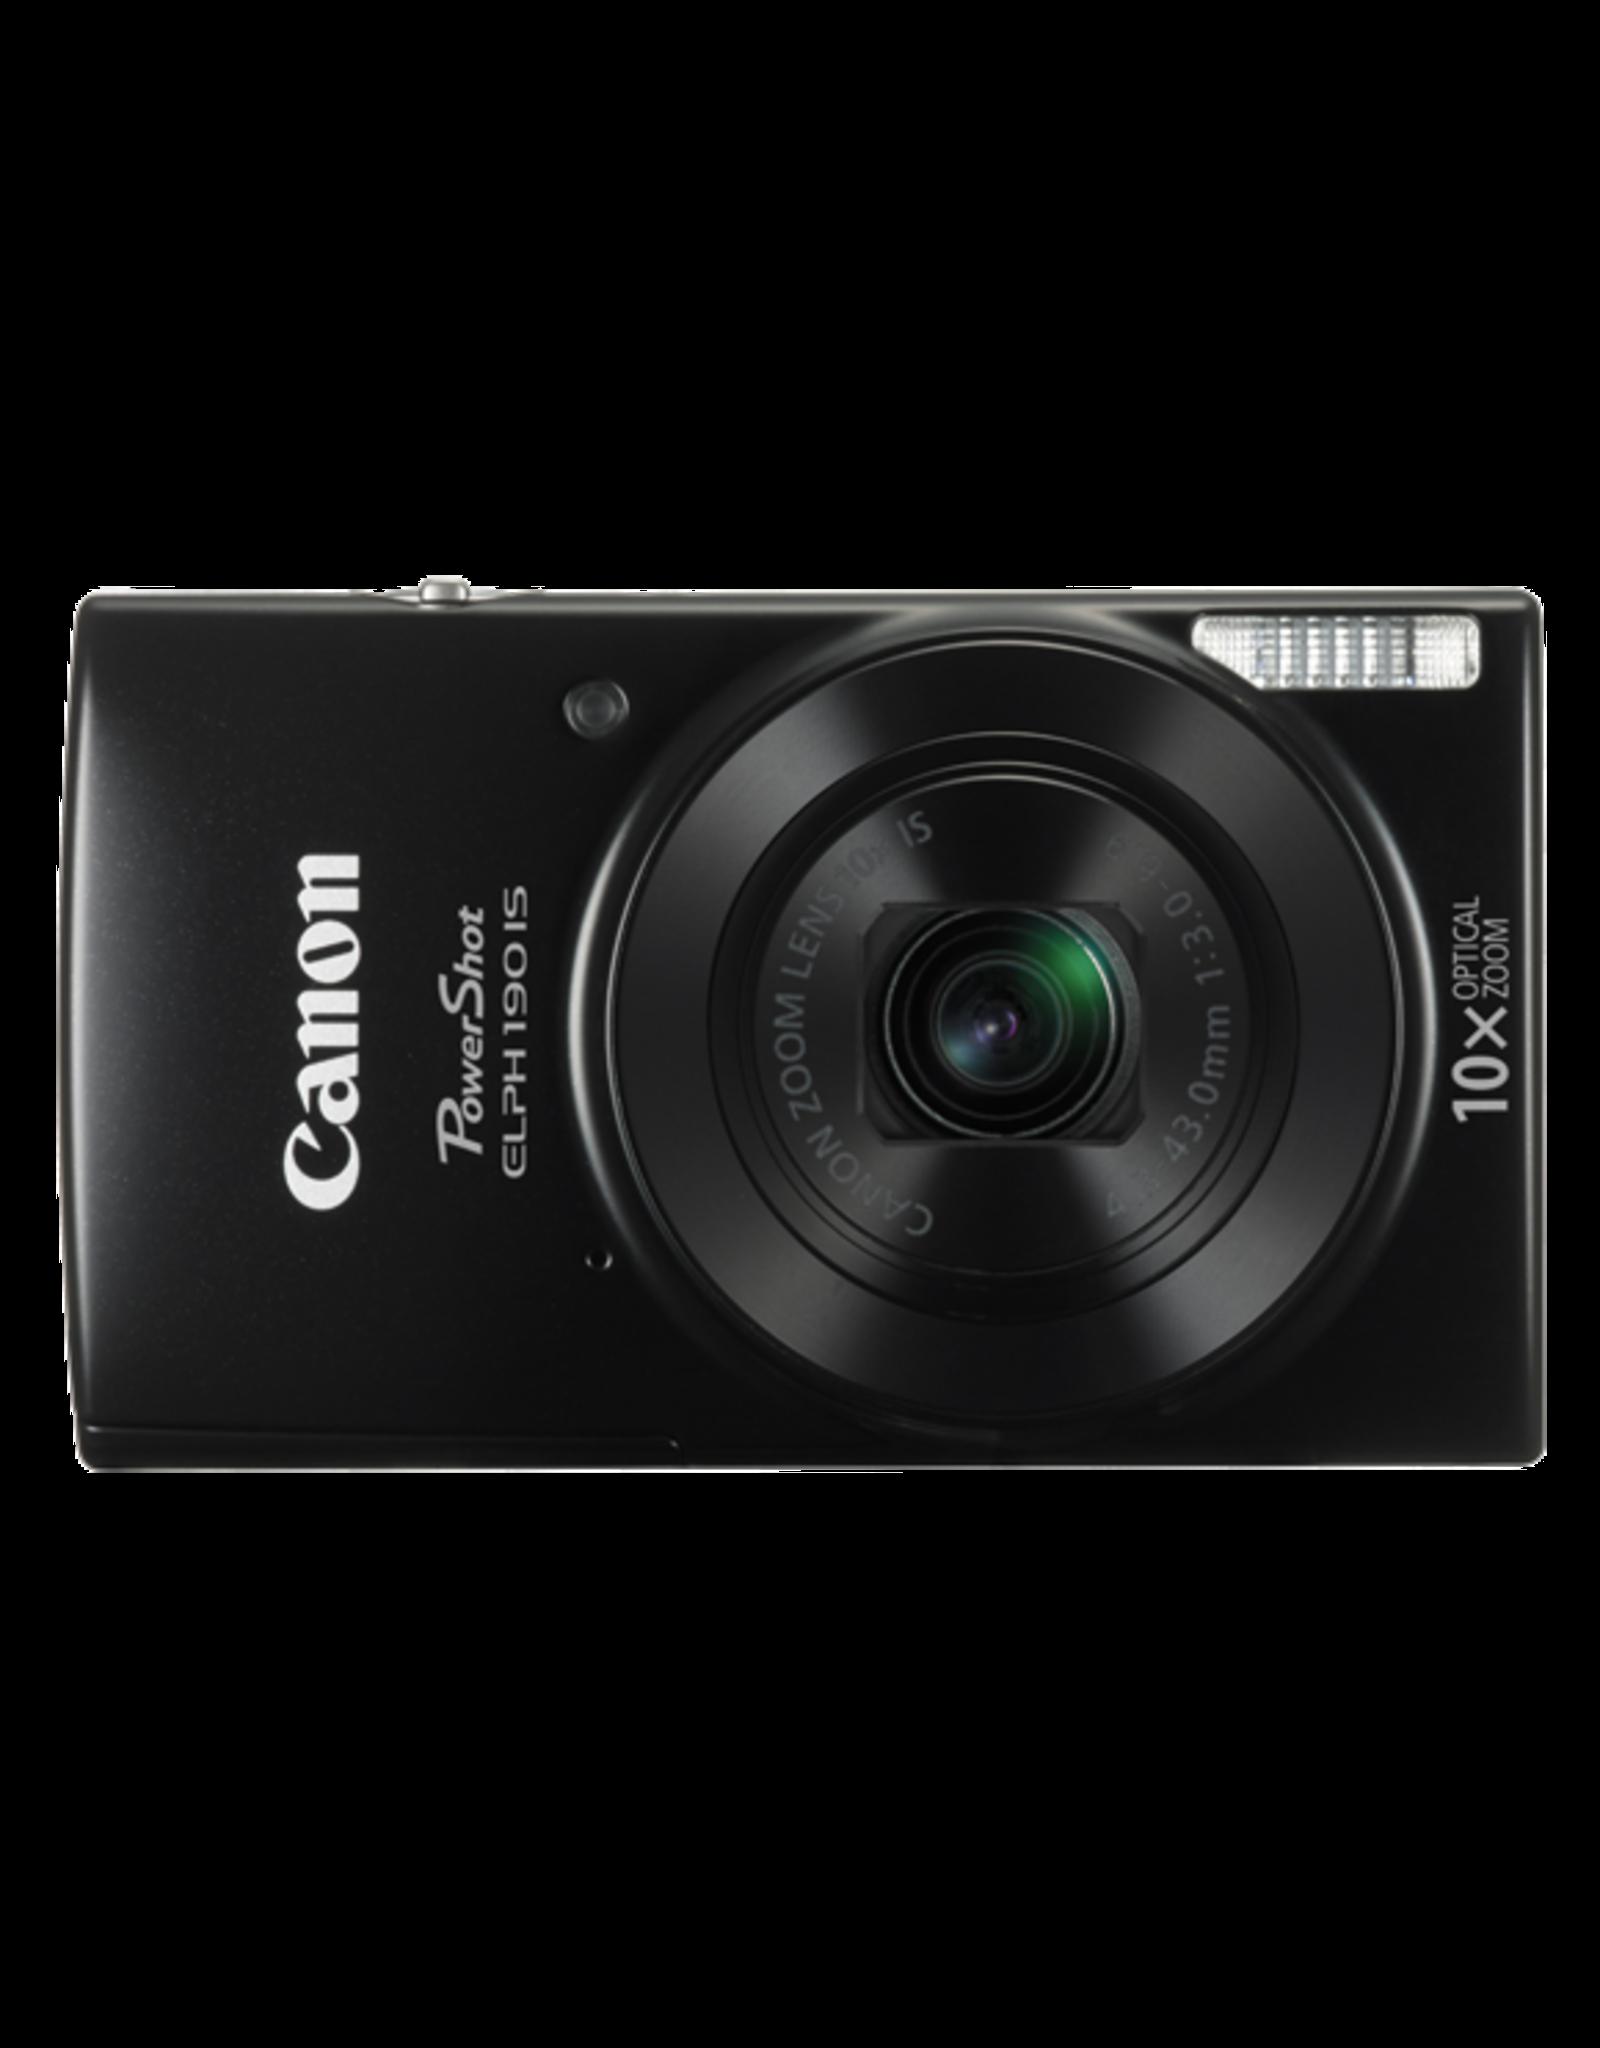 Canon PowerShot ELPH 190 IS - Black